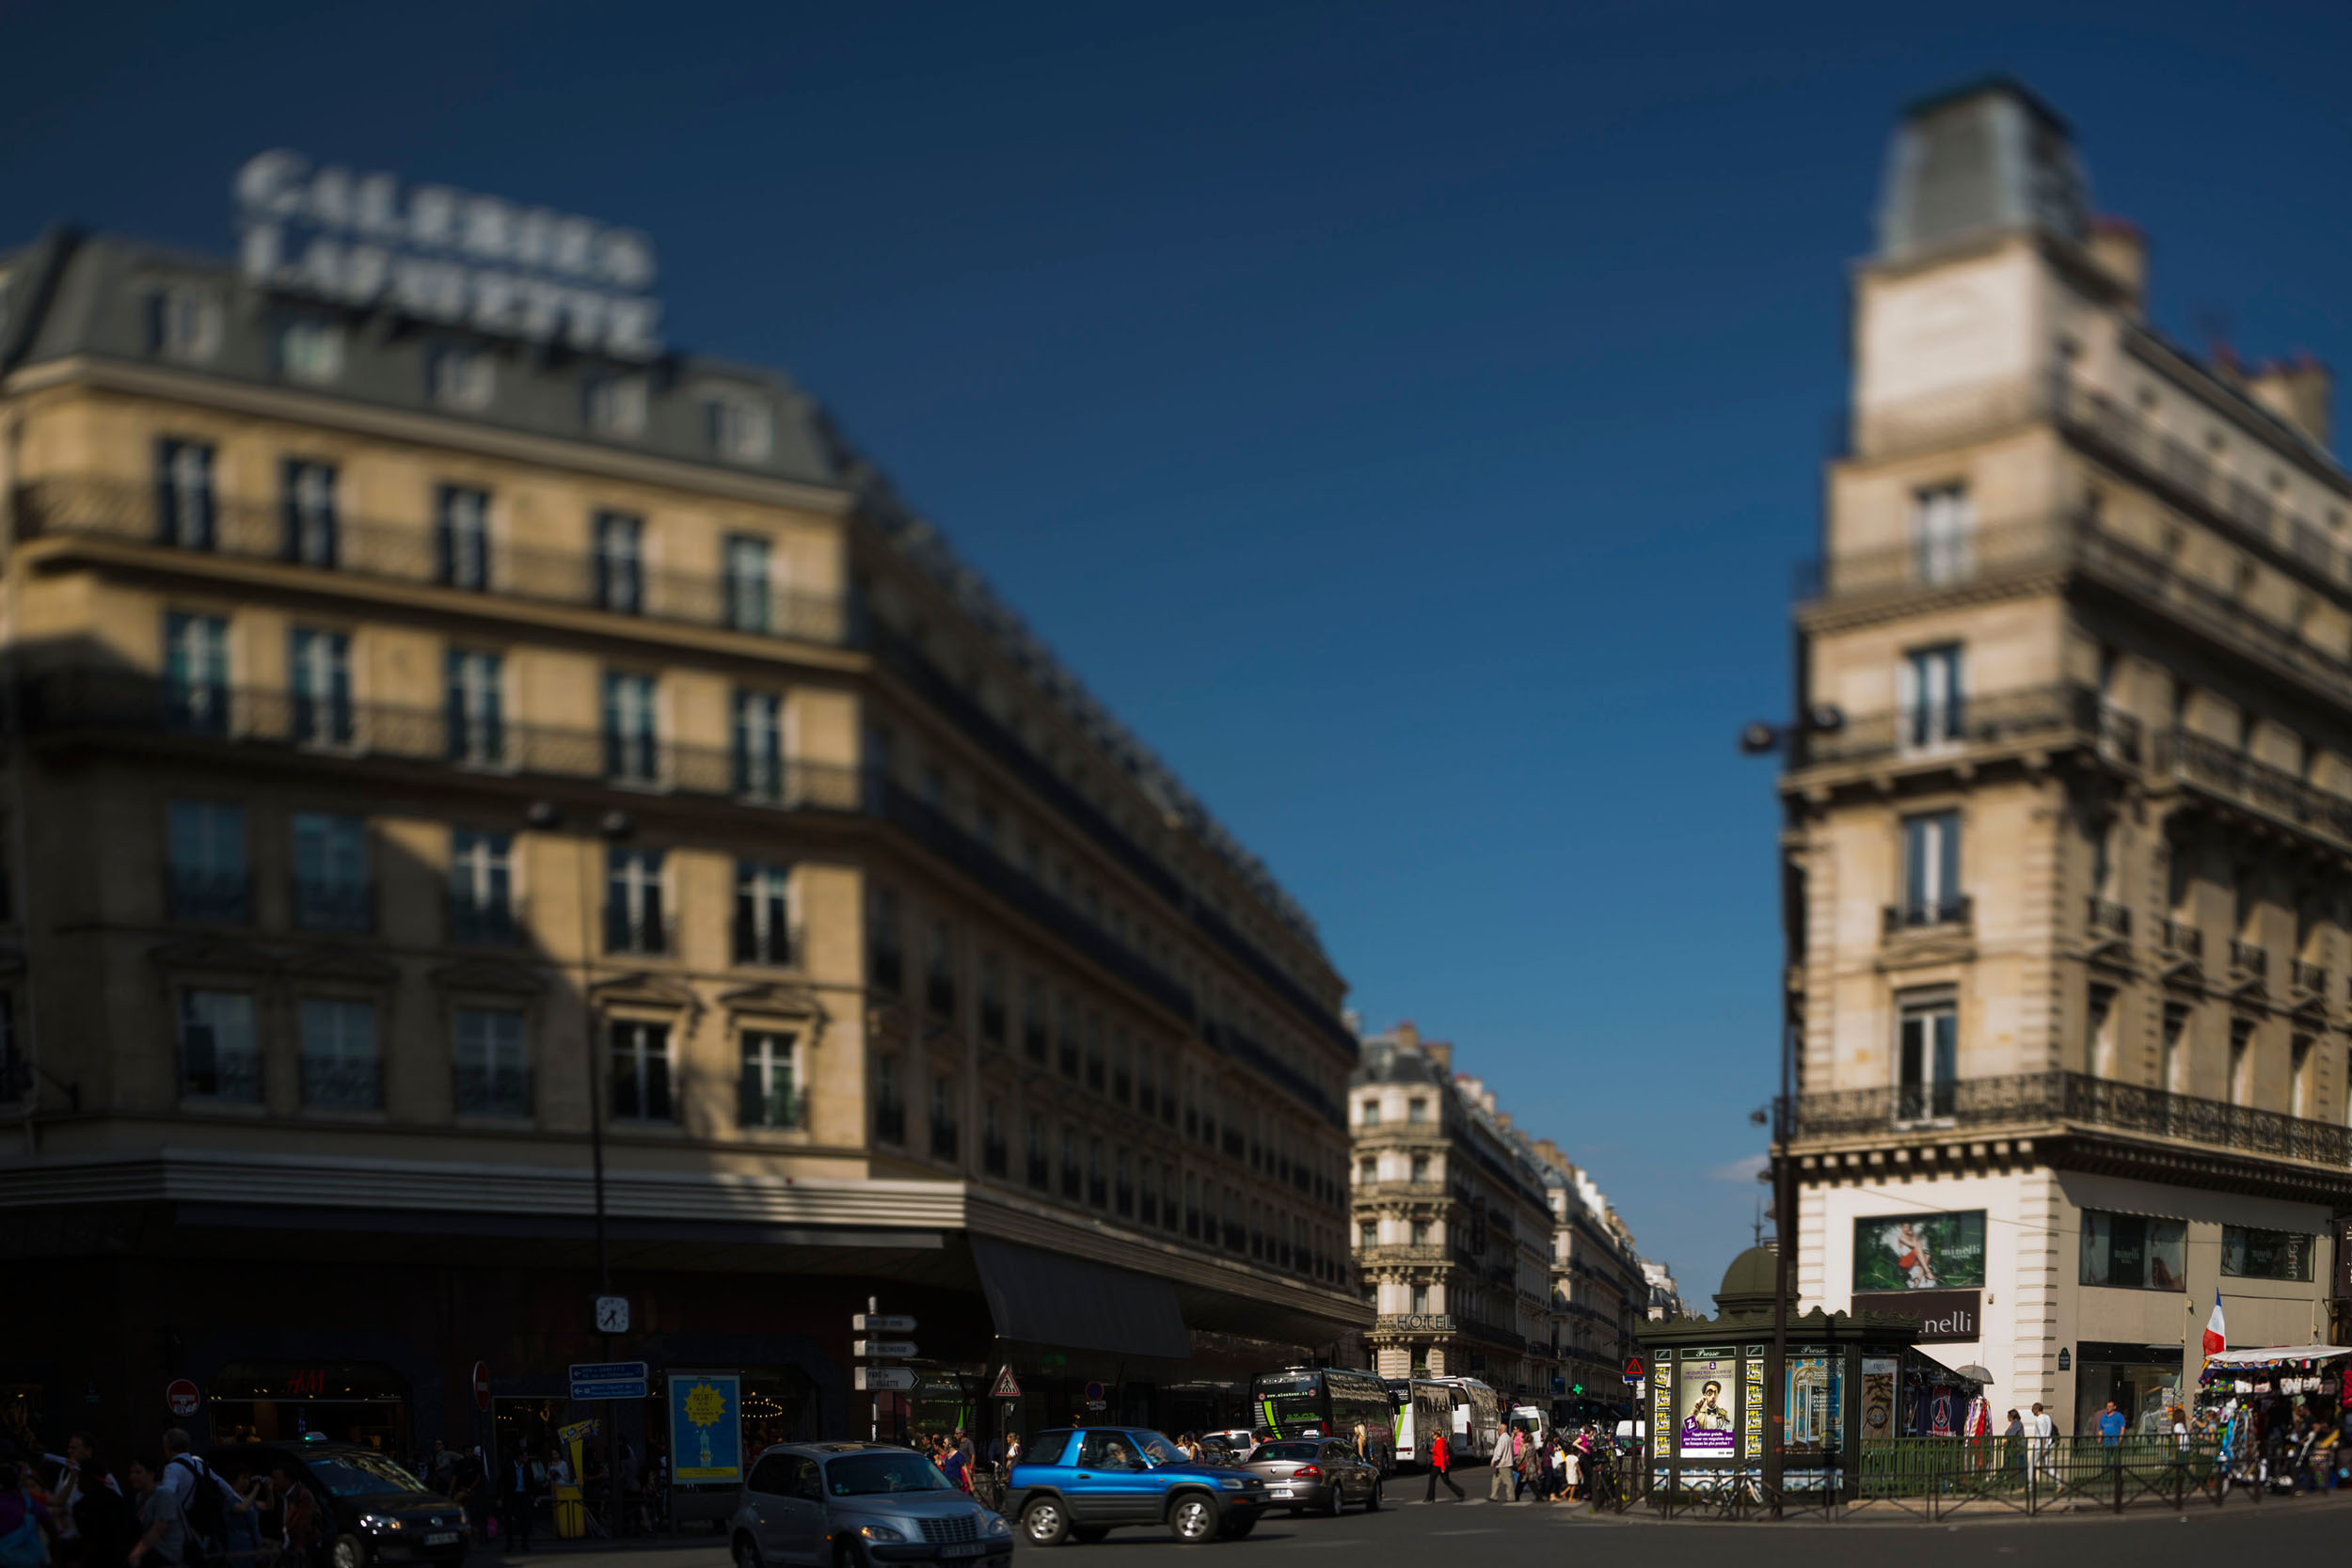 Paris Kiosk - Prestalis